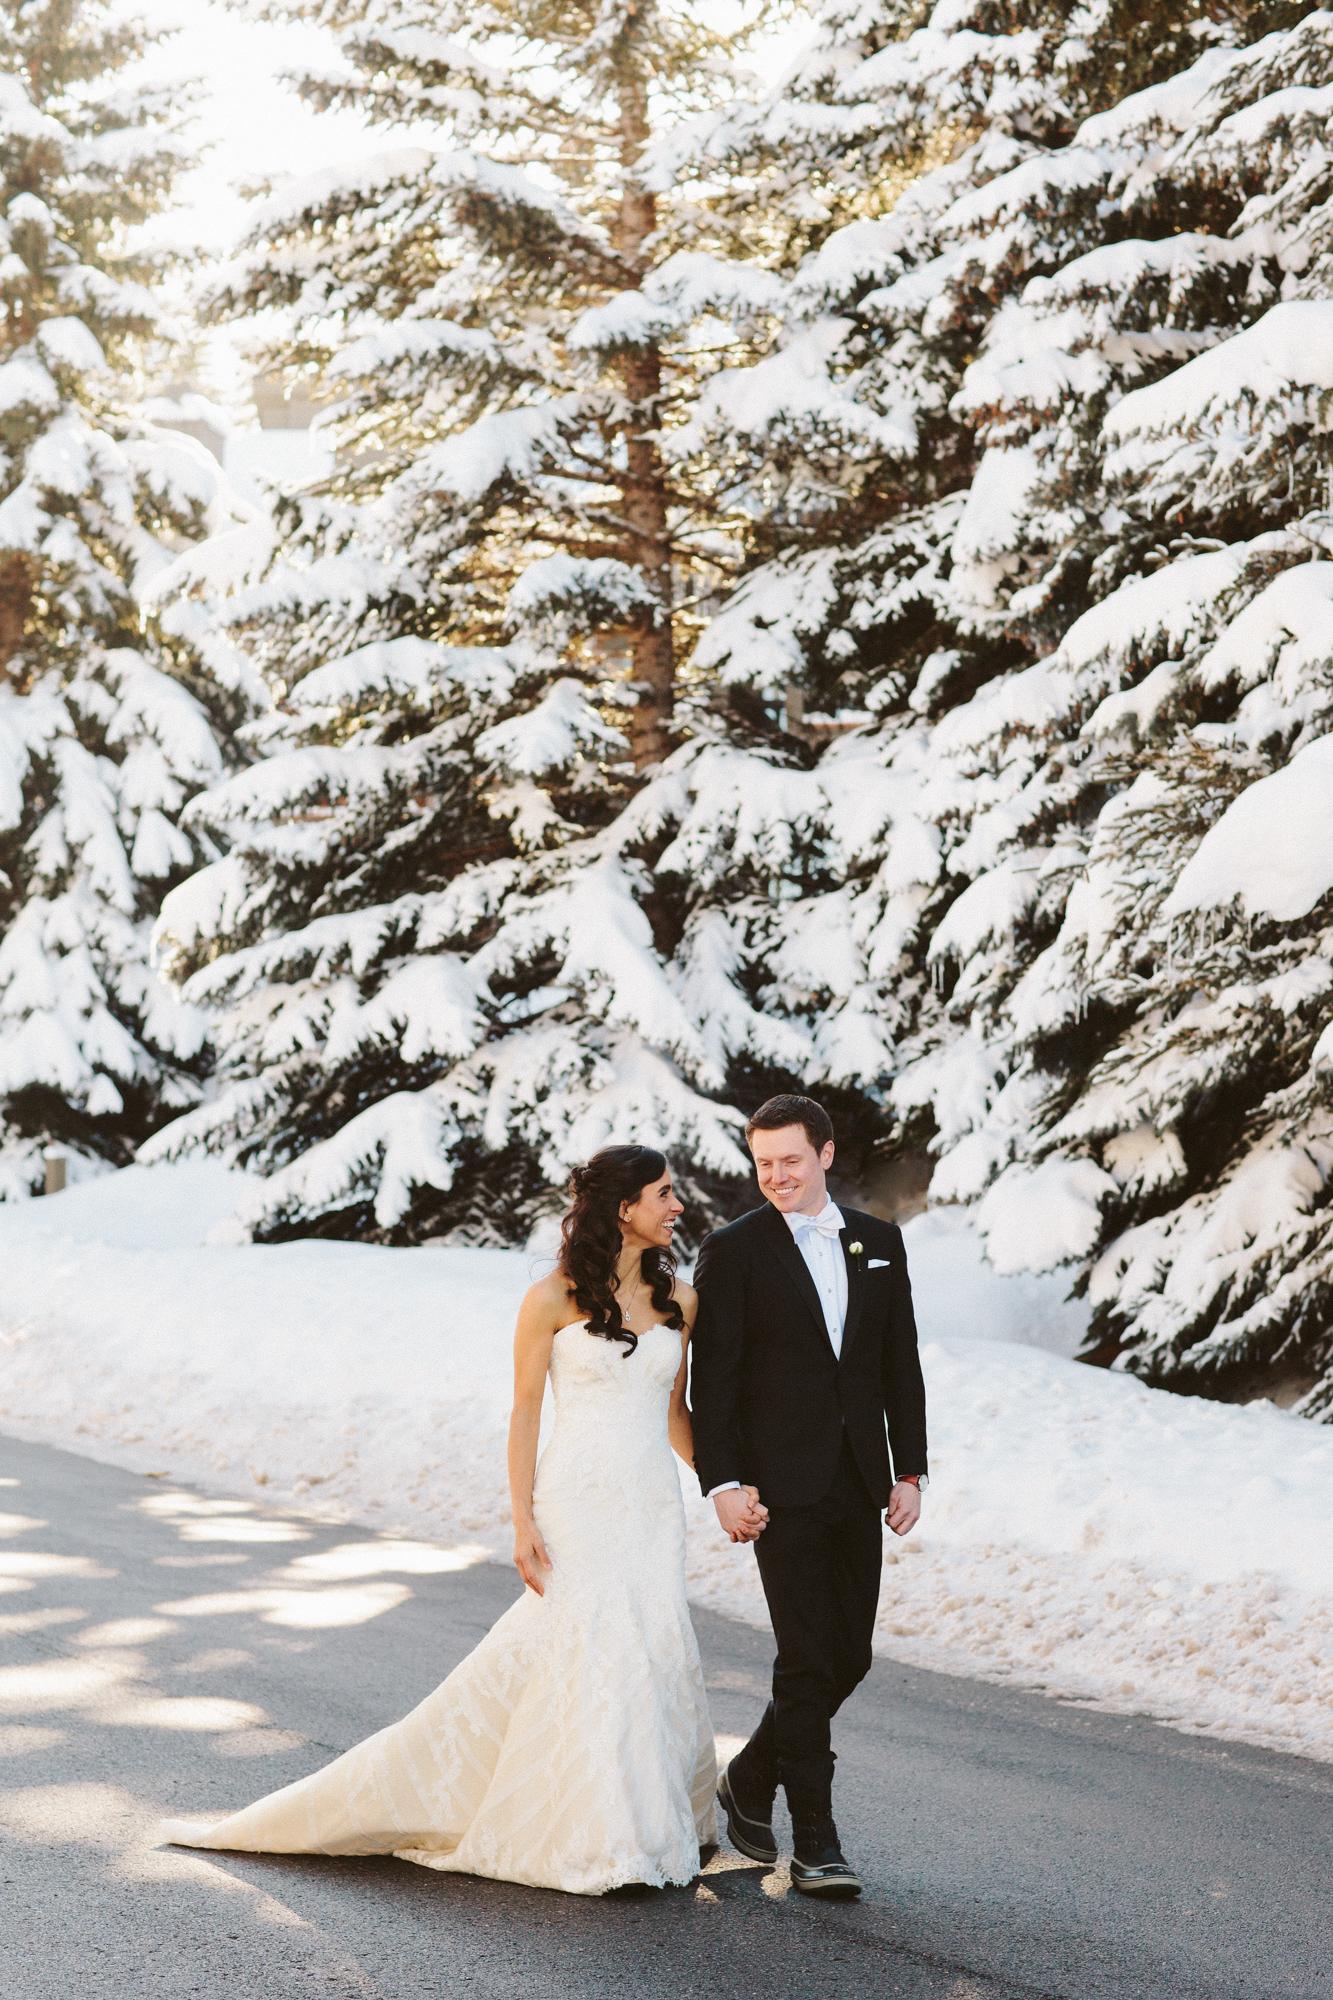 canyons-red-pine-lodge-wedding-13.jpg